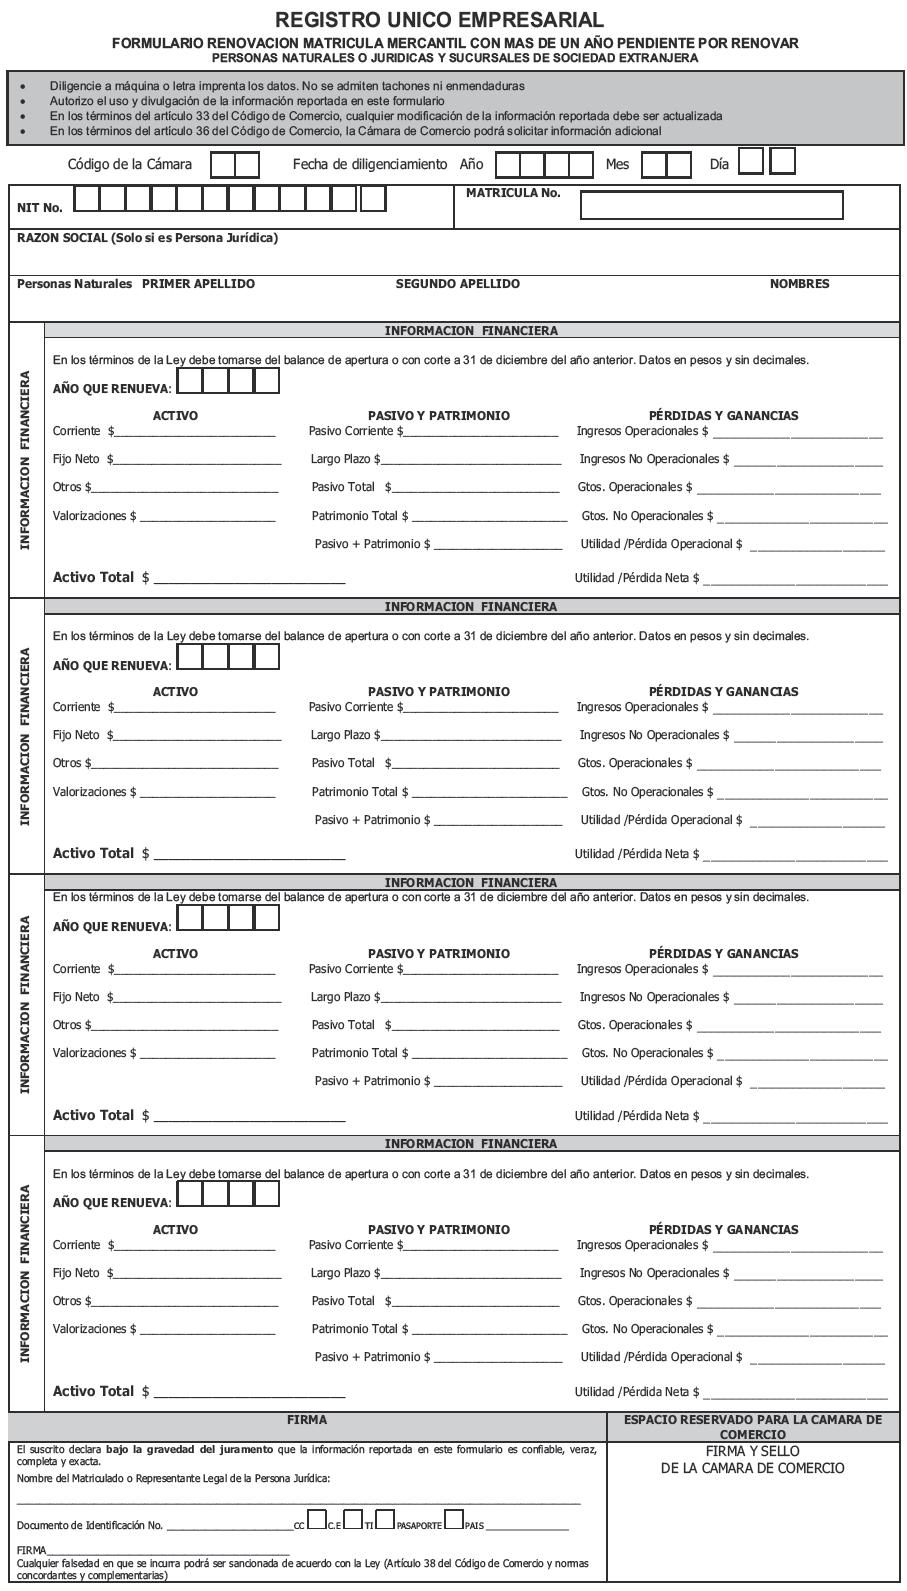 formulario 4.JPG